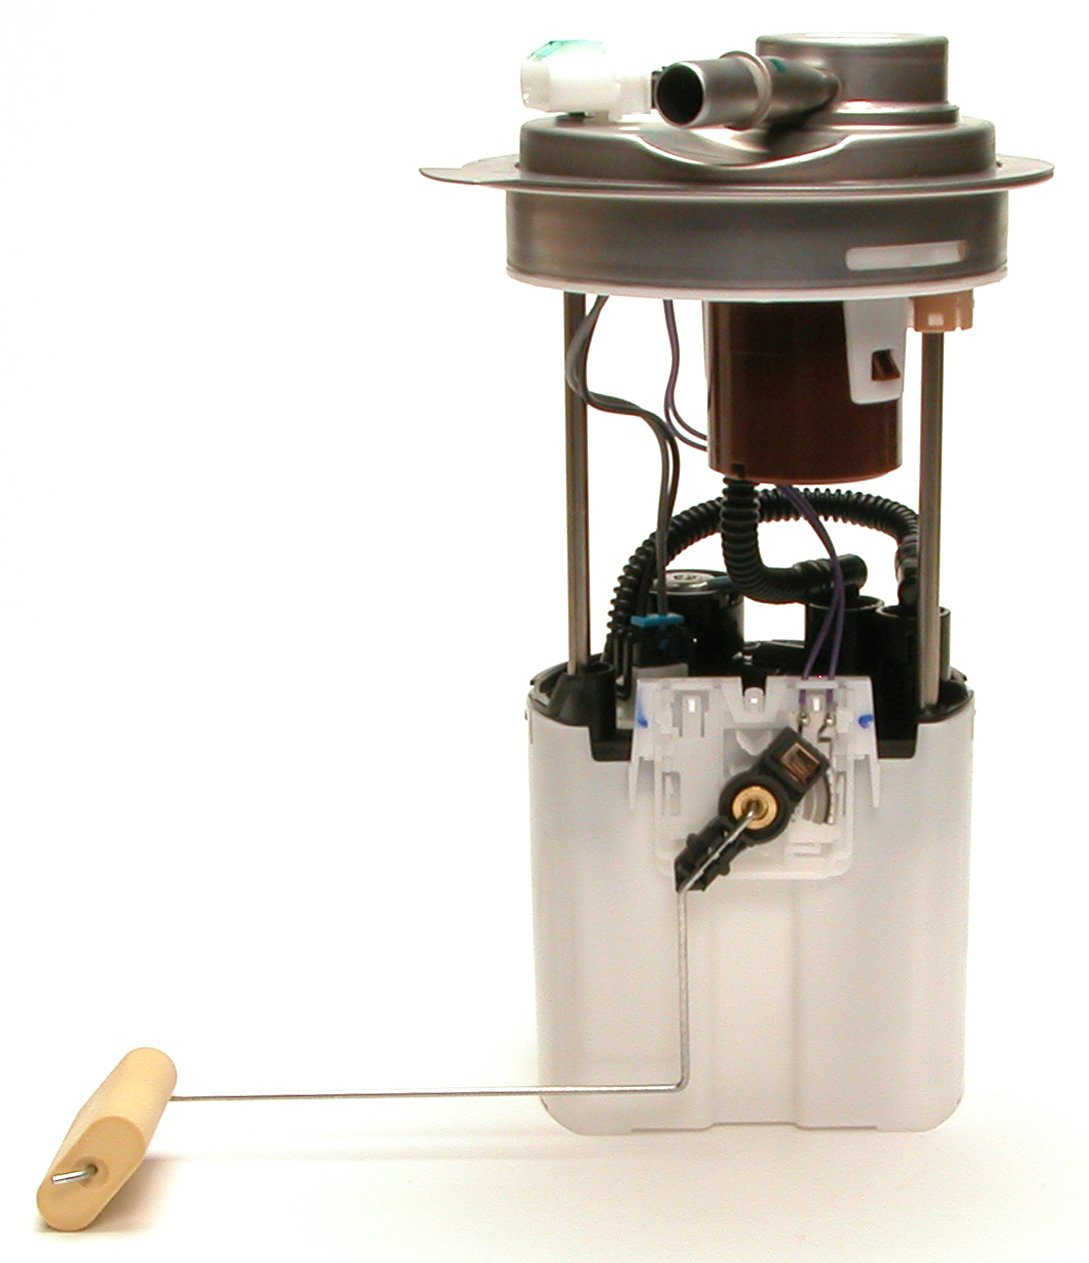 Delphi FG0435 Fuel Pump Module